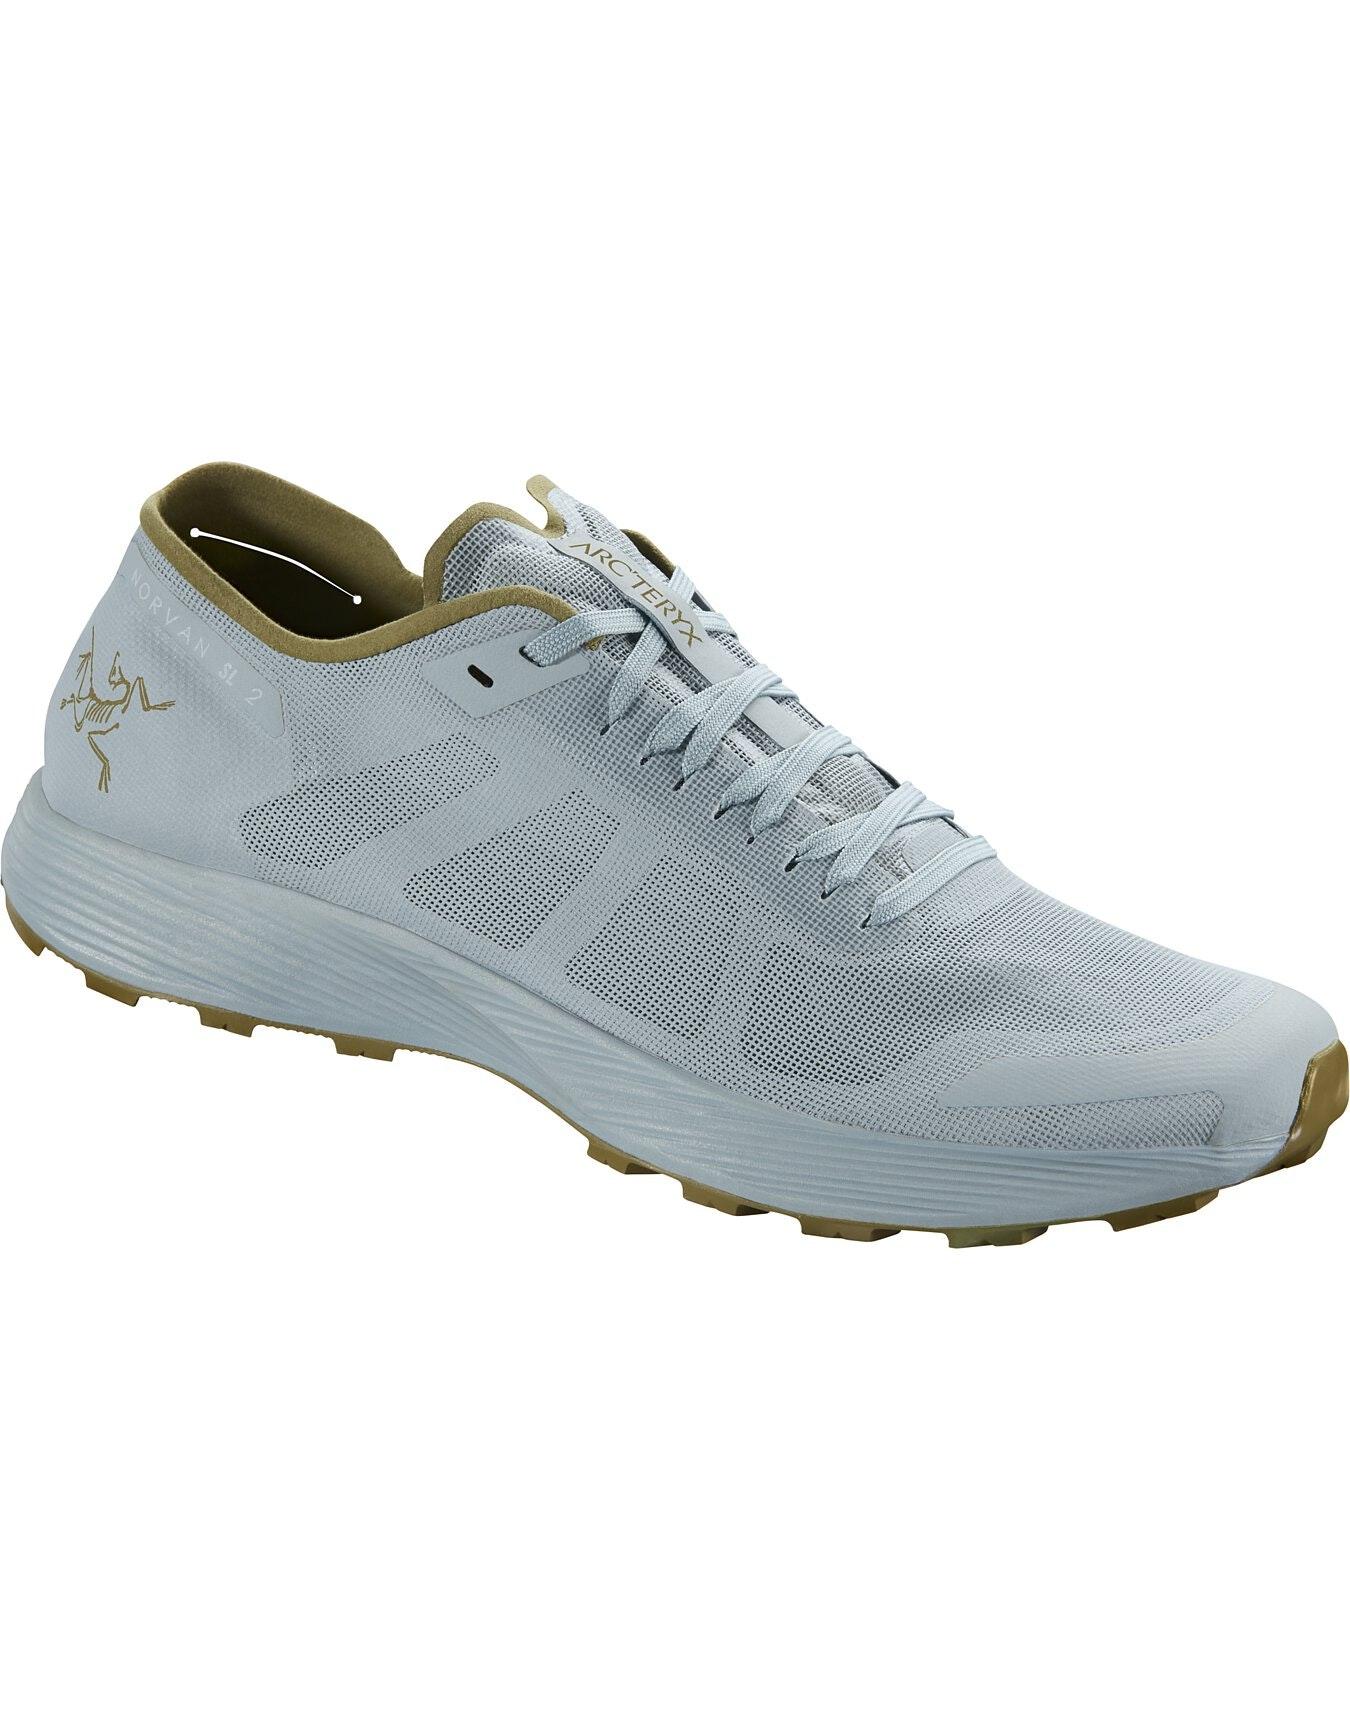 Norvan SL 2 Shoe Immersion/Light Tatsu